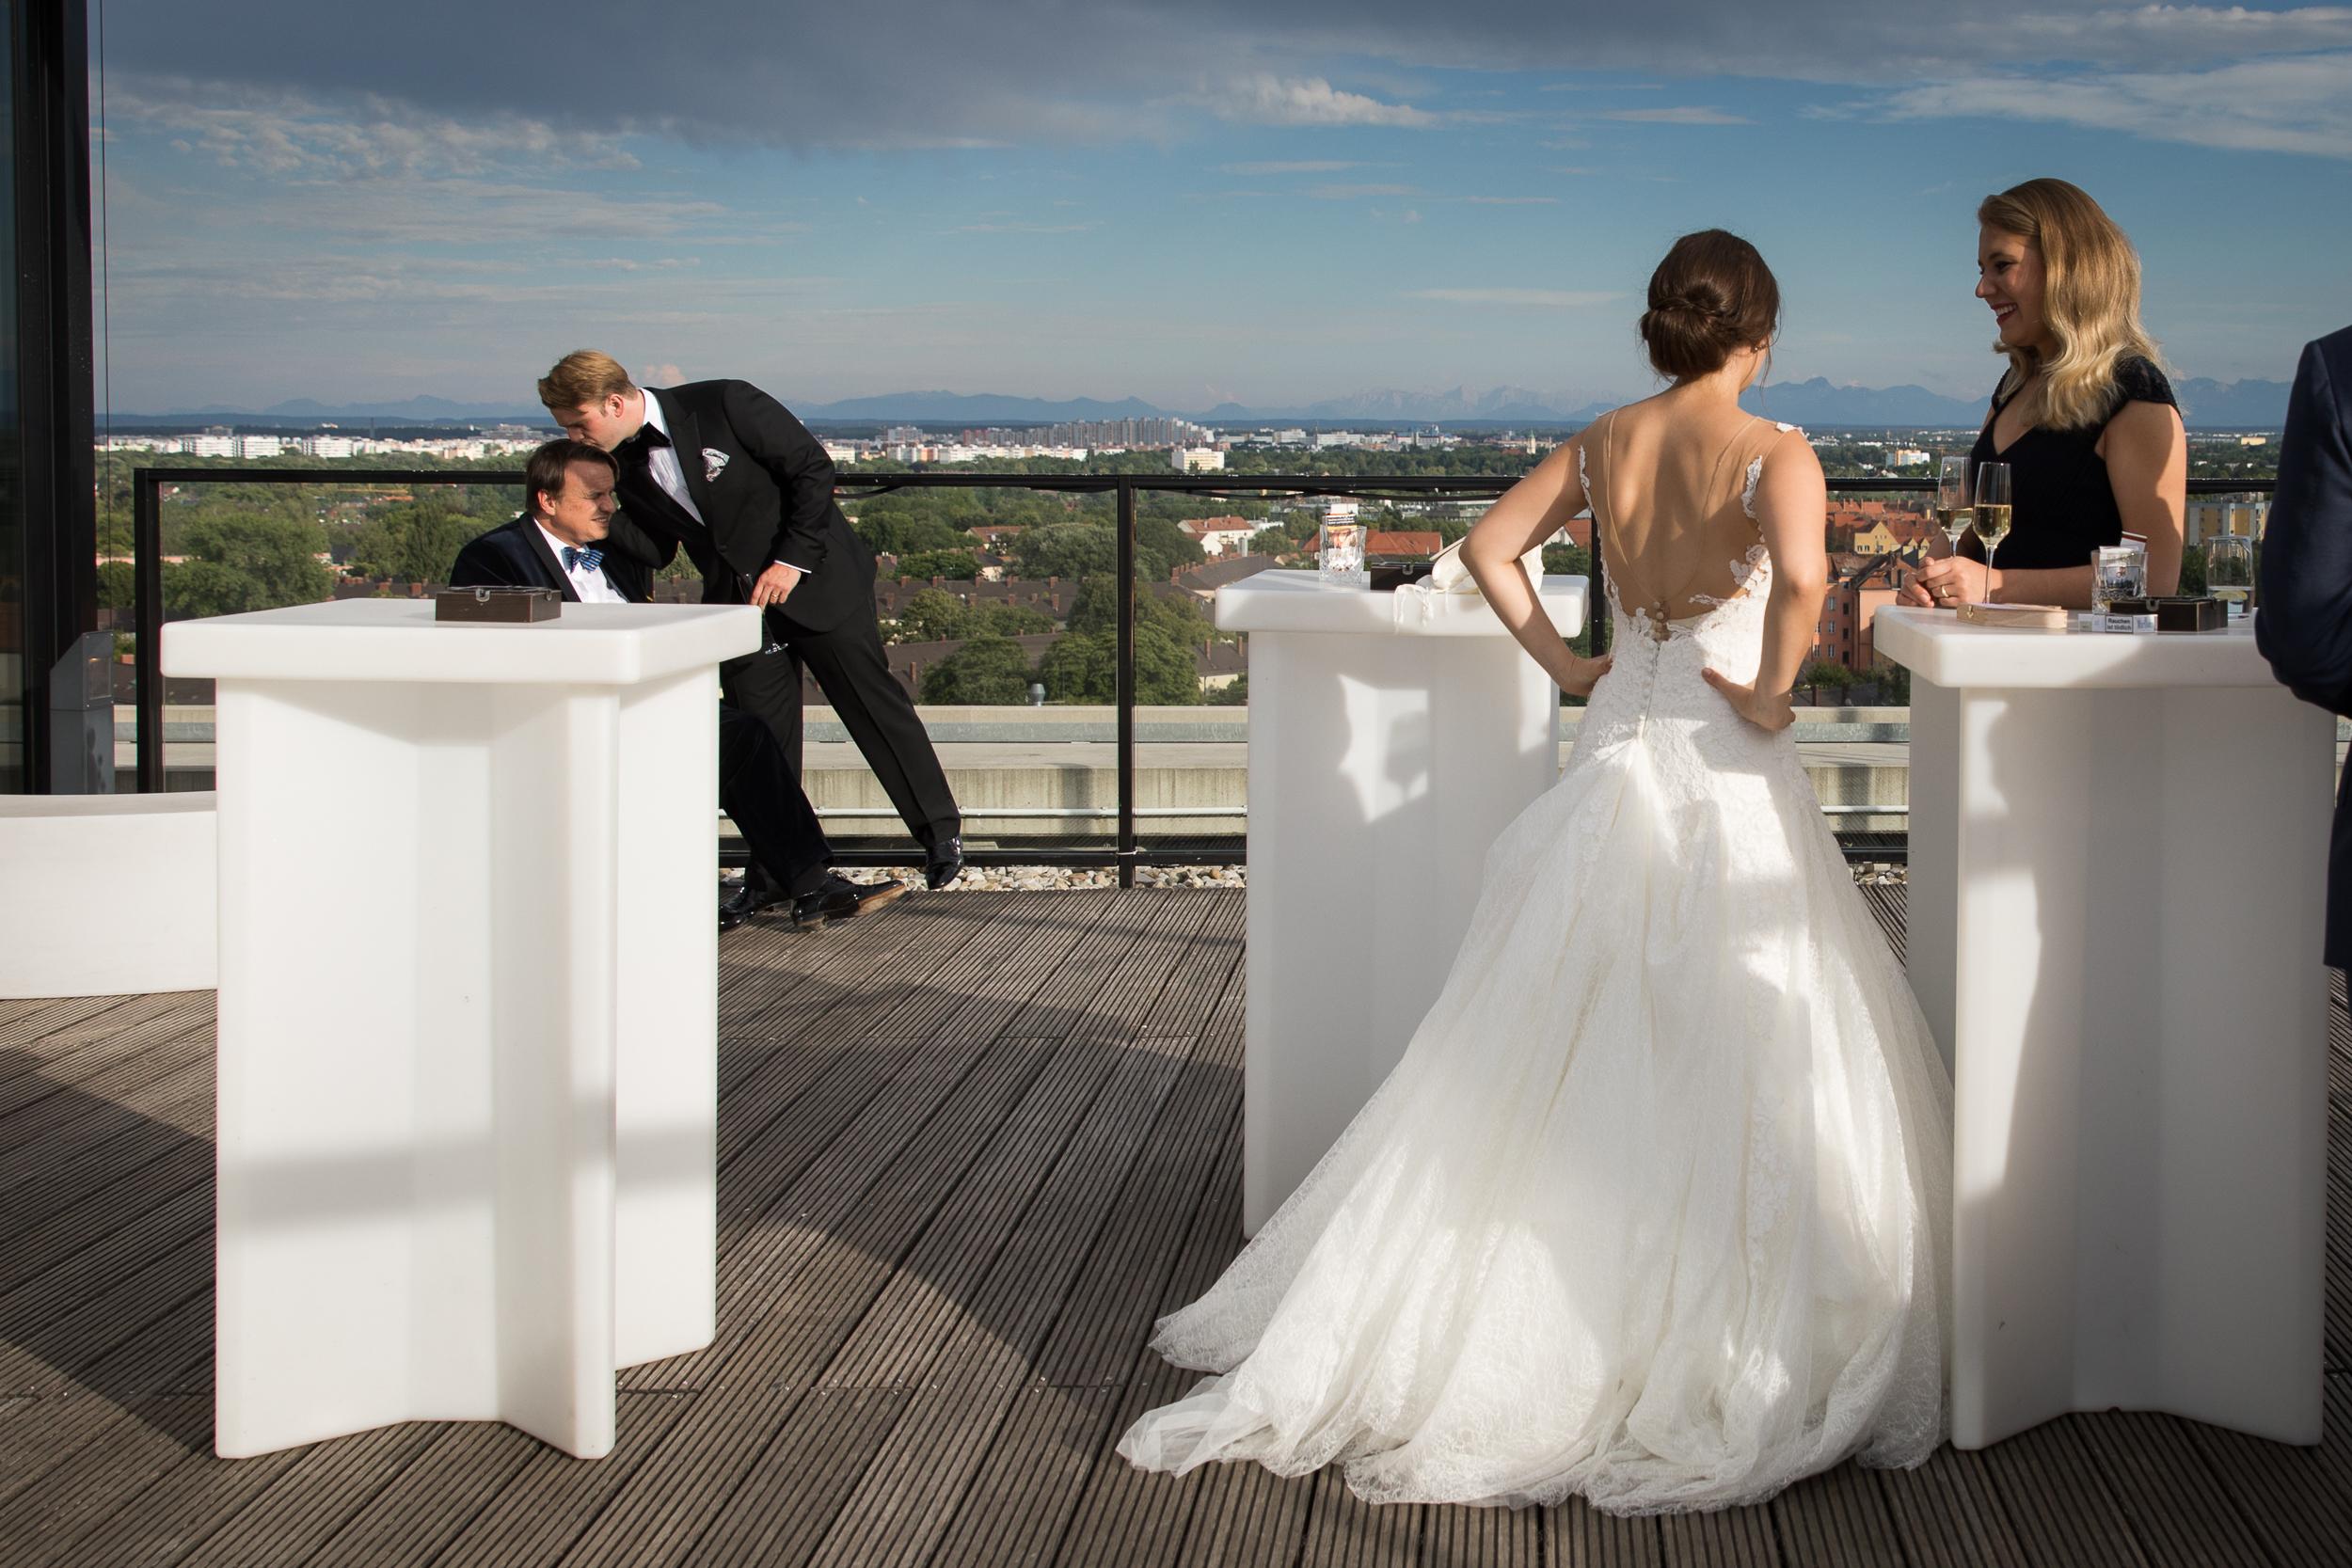 Gregg_Thorne_Wedding_Photographer_Munich_078.jpg